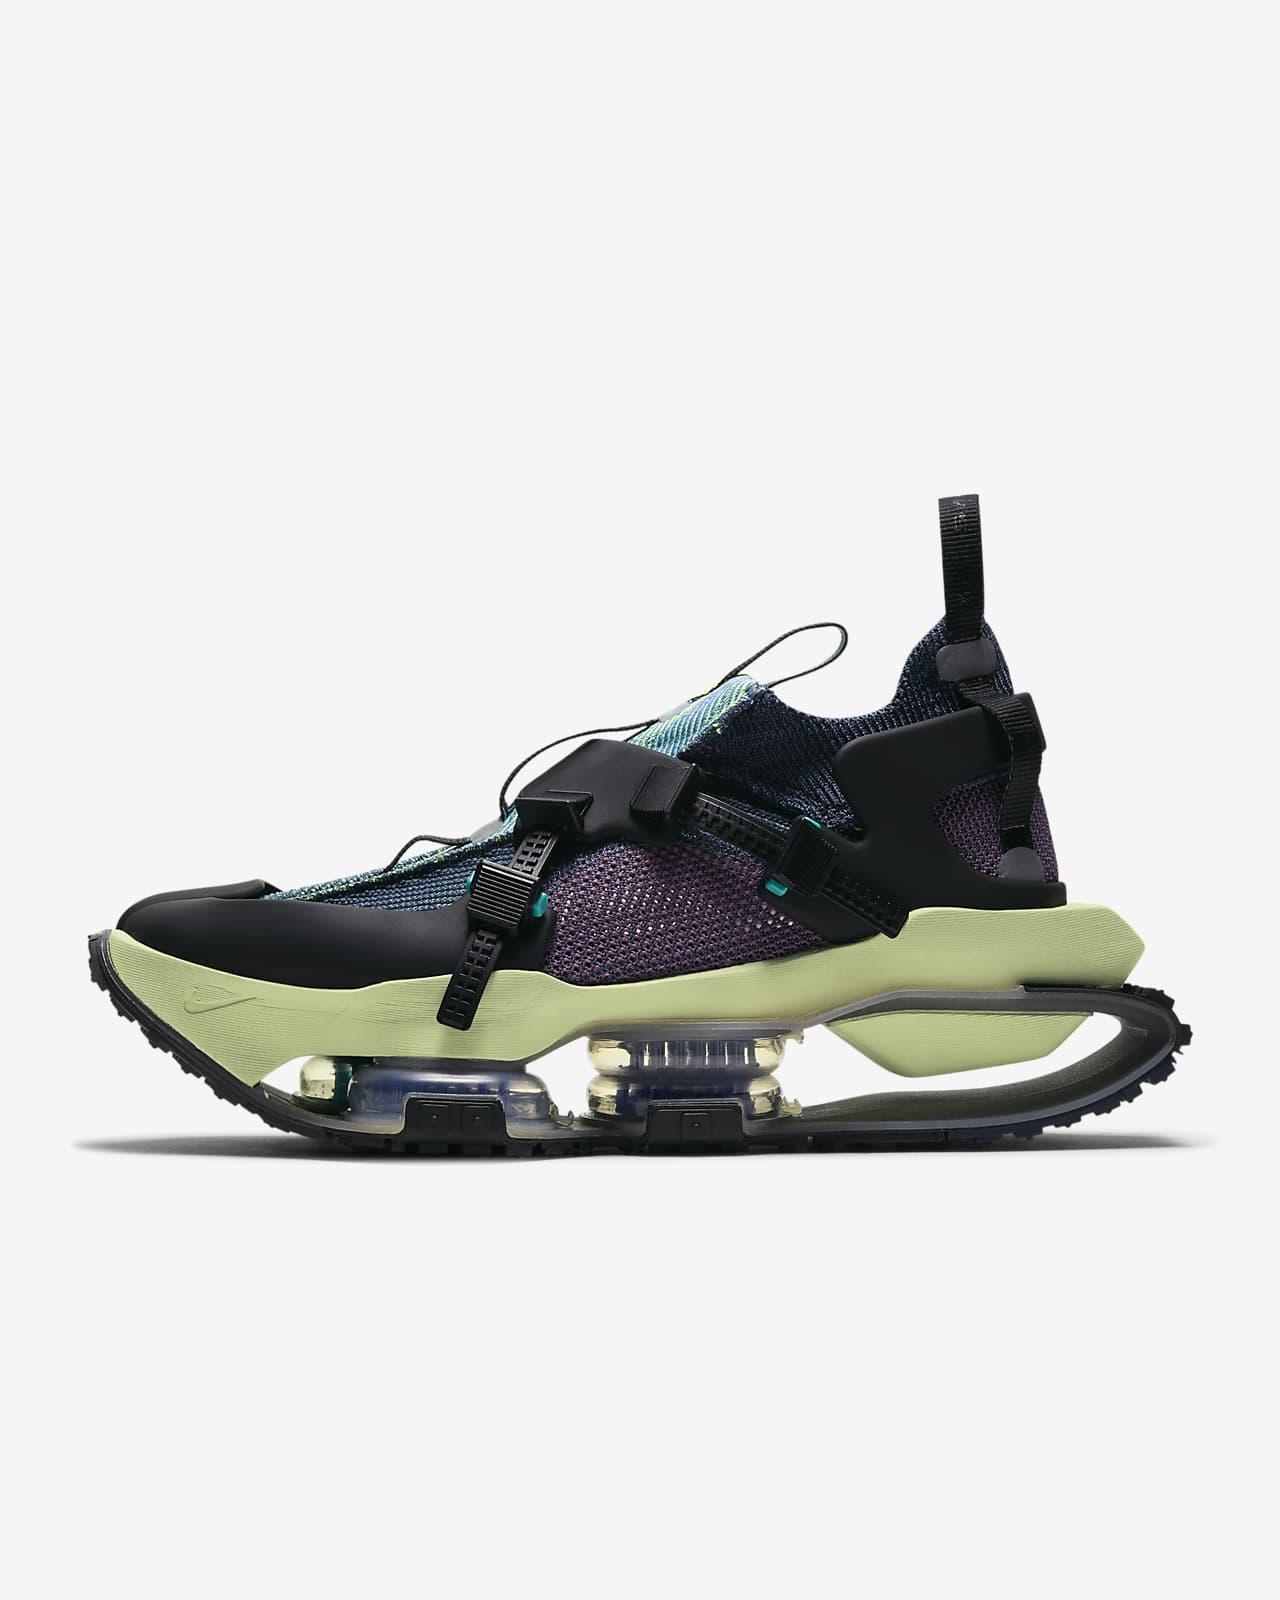 Nike ISPA Zoom Road Warrior Shoe